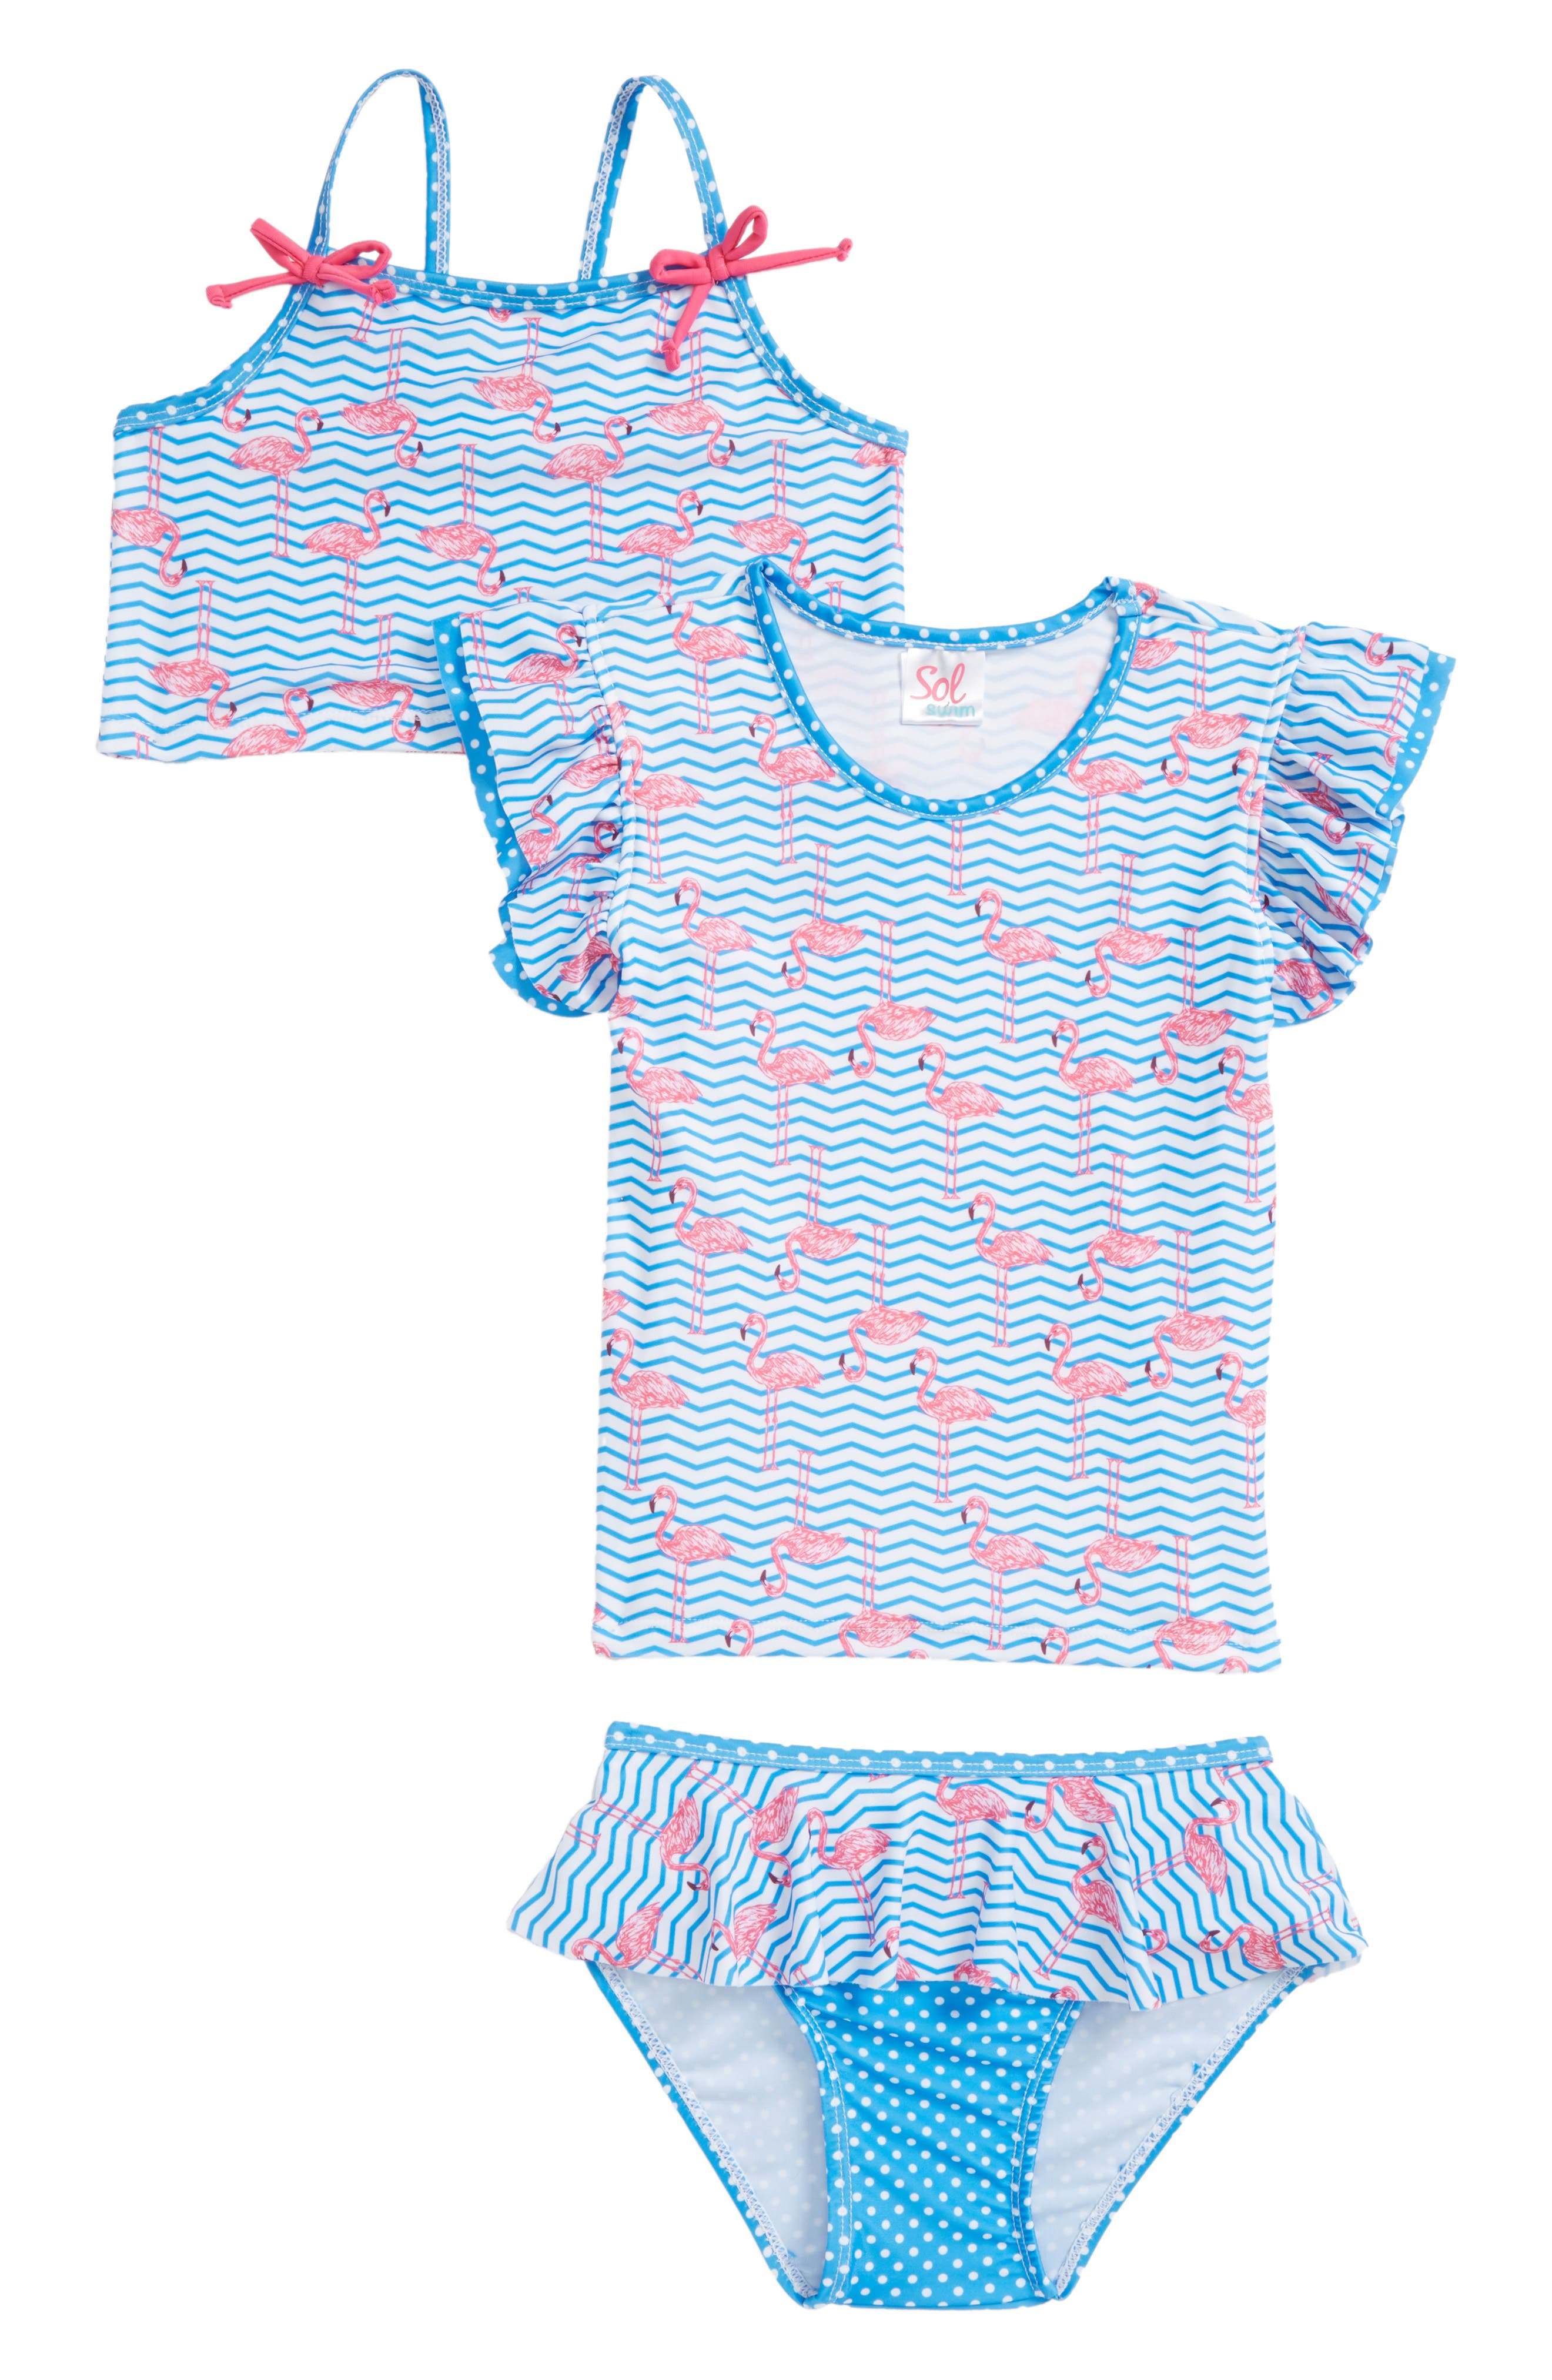 Sol Swim Zig Zag Flamingos Two-Piece Swimsuit with Rashguard (Toddler Girls & Little Girls)